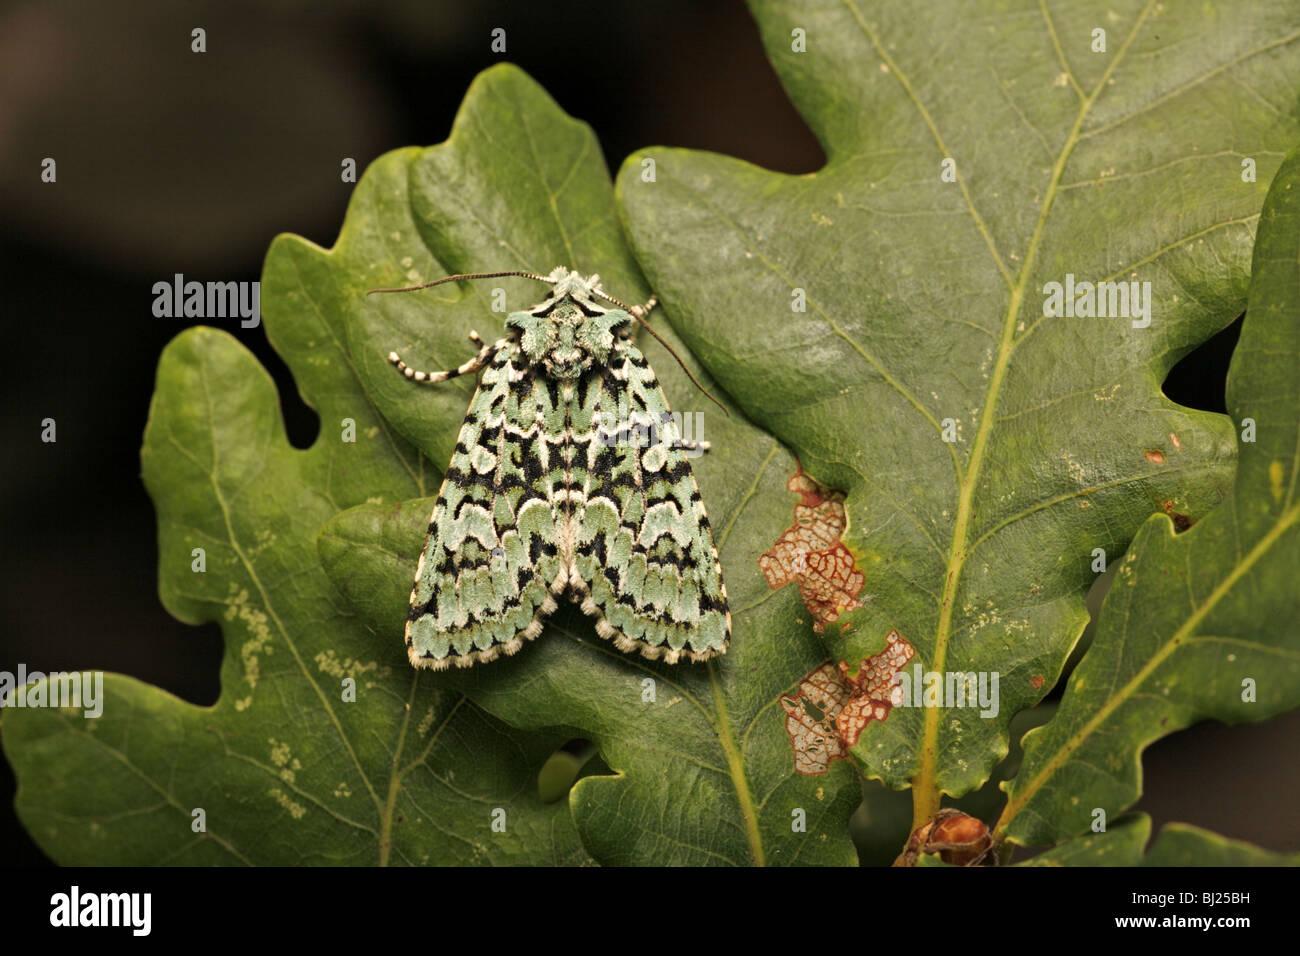 merveille du jour dichonia aprilina on oak leaves stock photo royalty free image 28322325 alamy. Black Bedroom Furniture Sets. Home Design Ideas